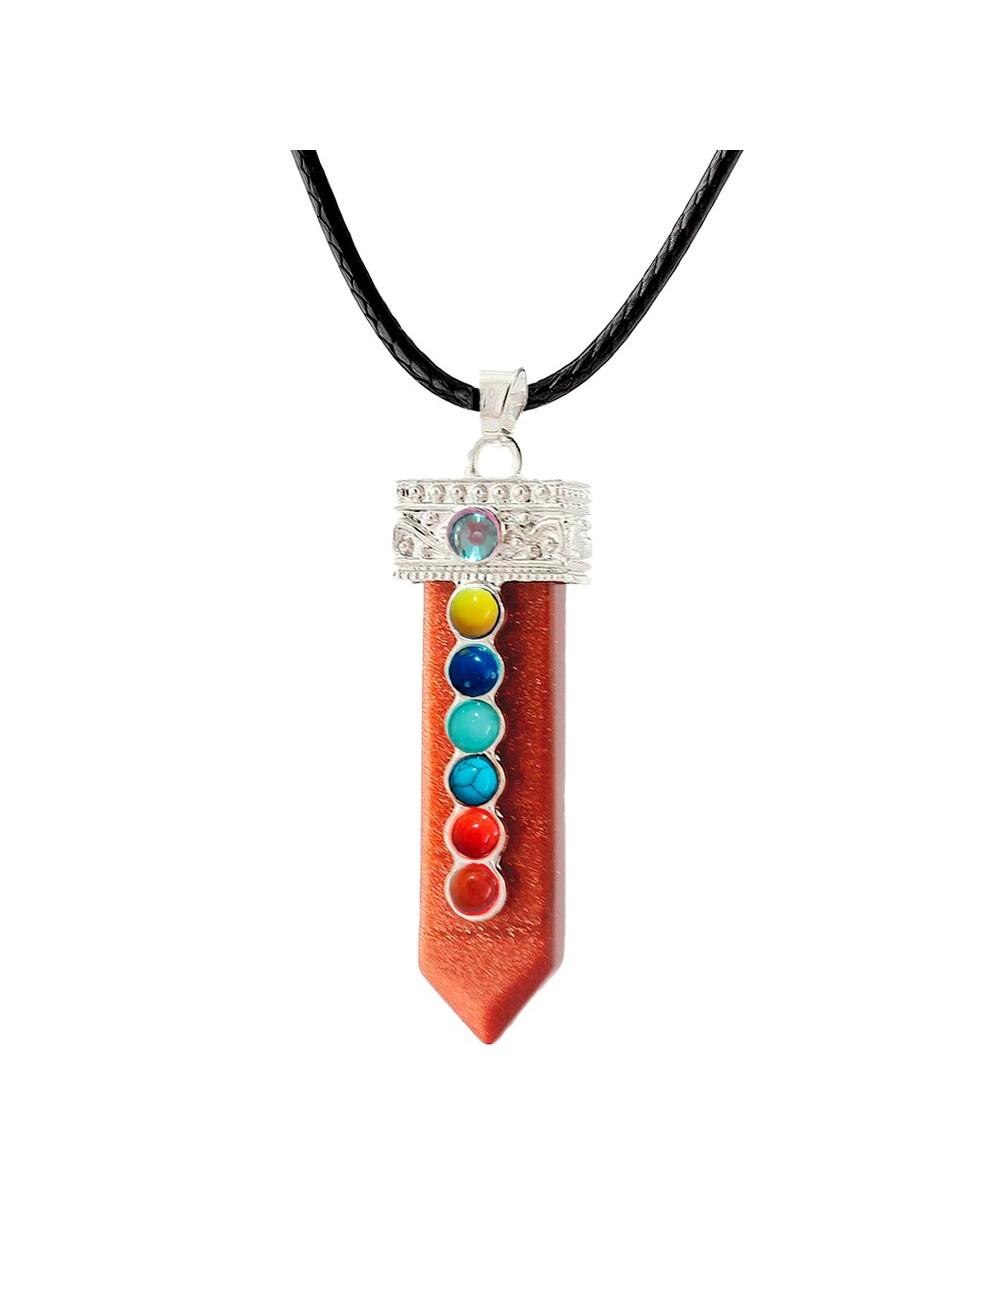 Collar 7 Chakras Dayoshop 29,900.00